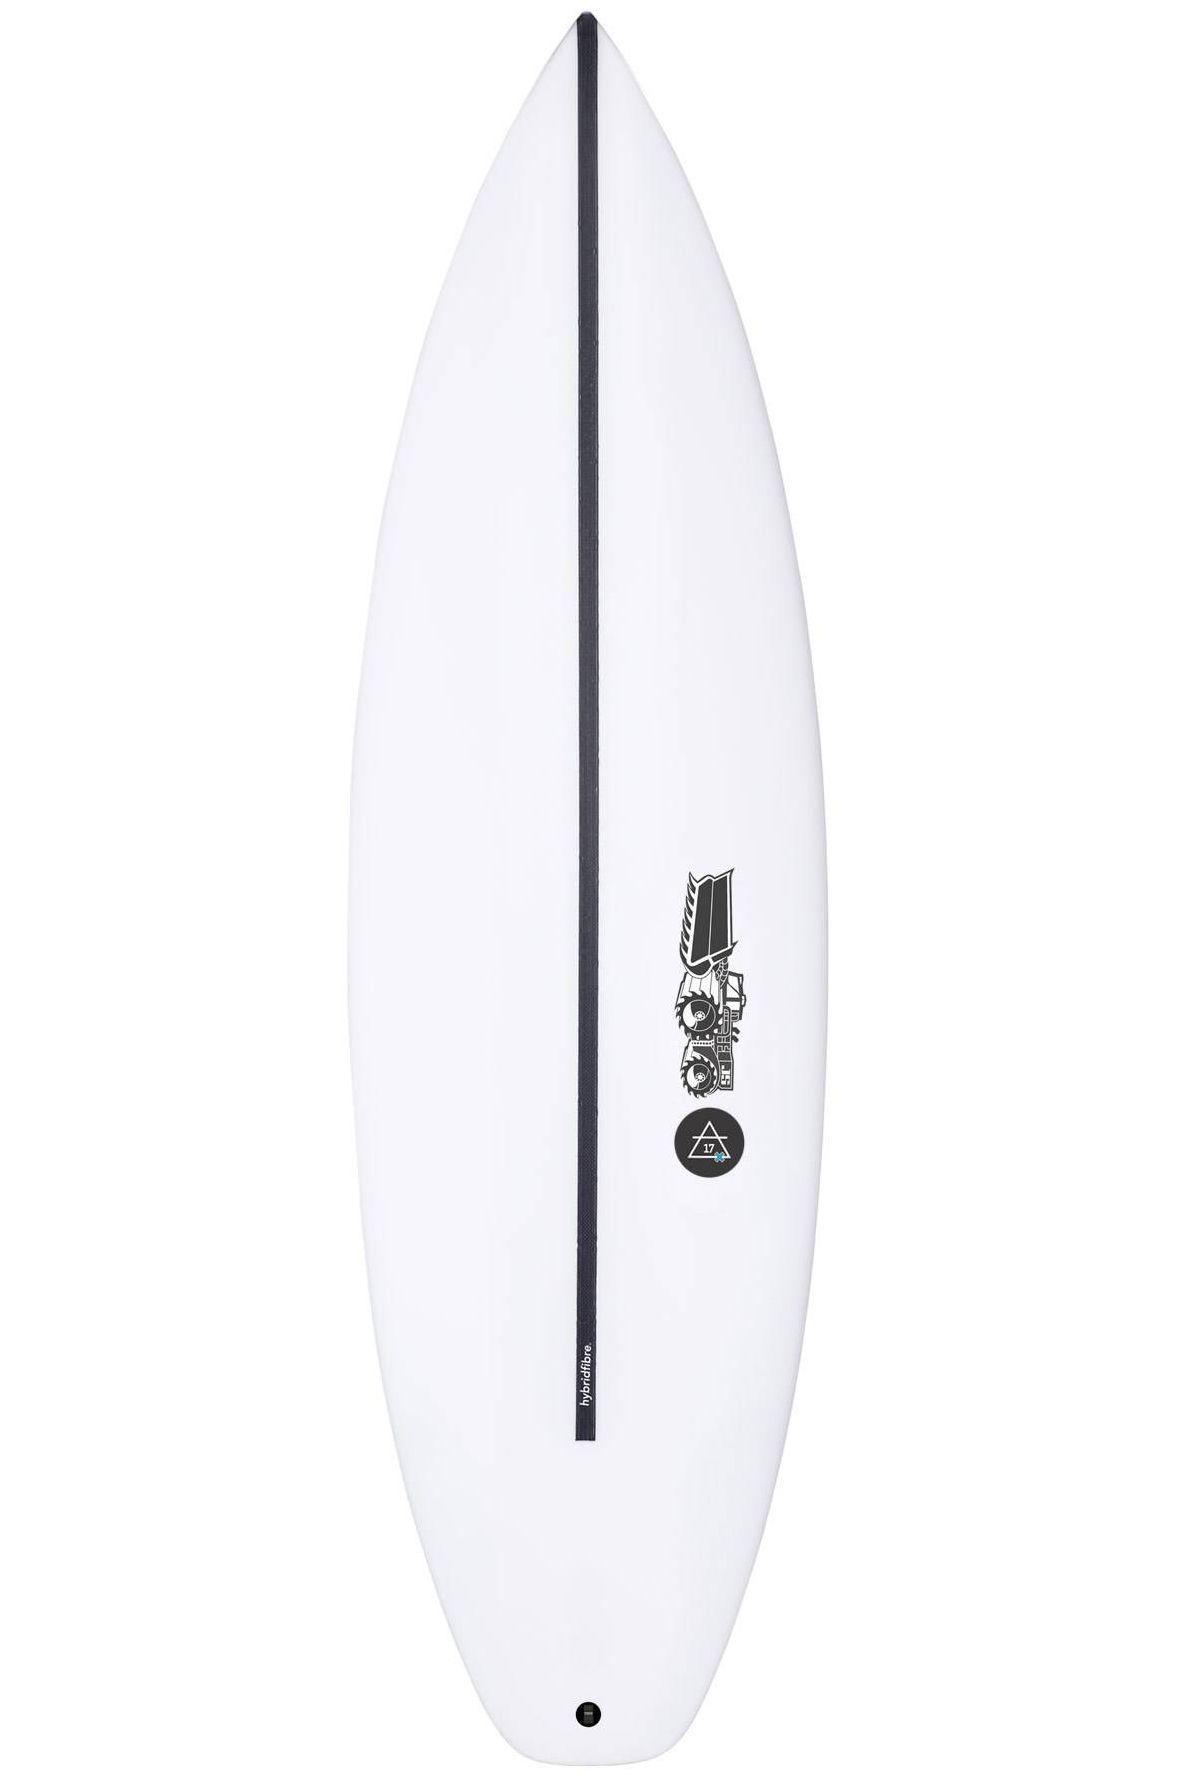 Prancha Surf JS 5'10 JULIAN AIR- 17X Squash Tail - White FCS II 5ft10